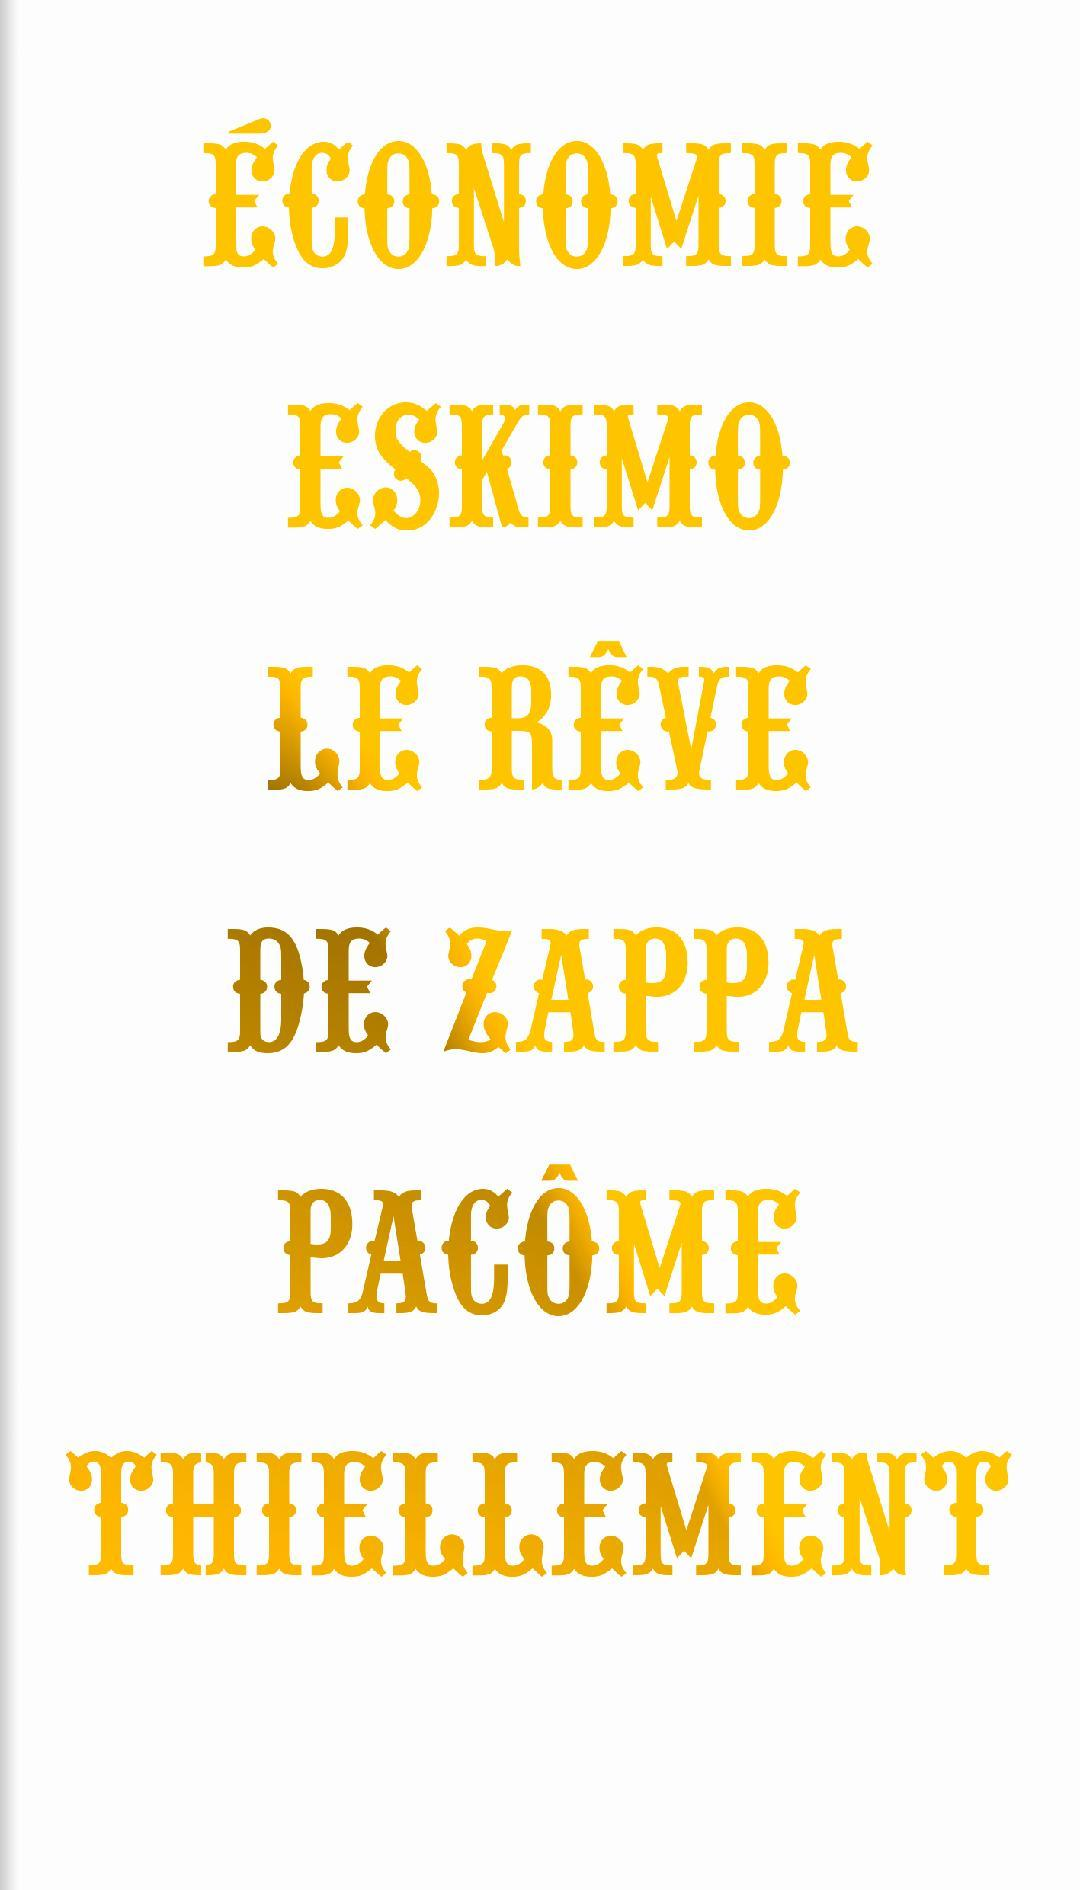 ECONOMIE ESKIMO - LE REVE DE ZAPPA - LE REVE DE ZAPPA